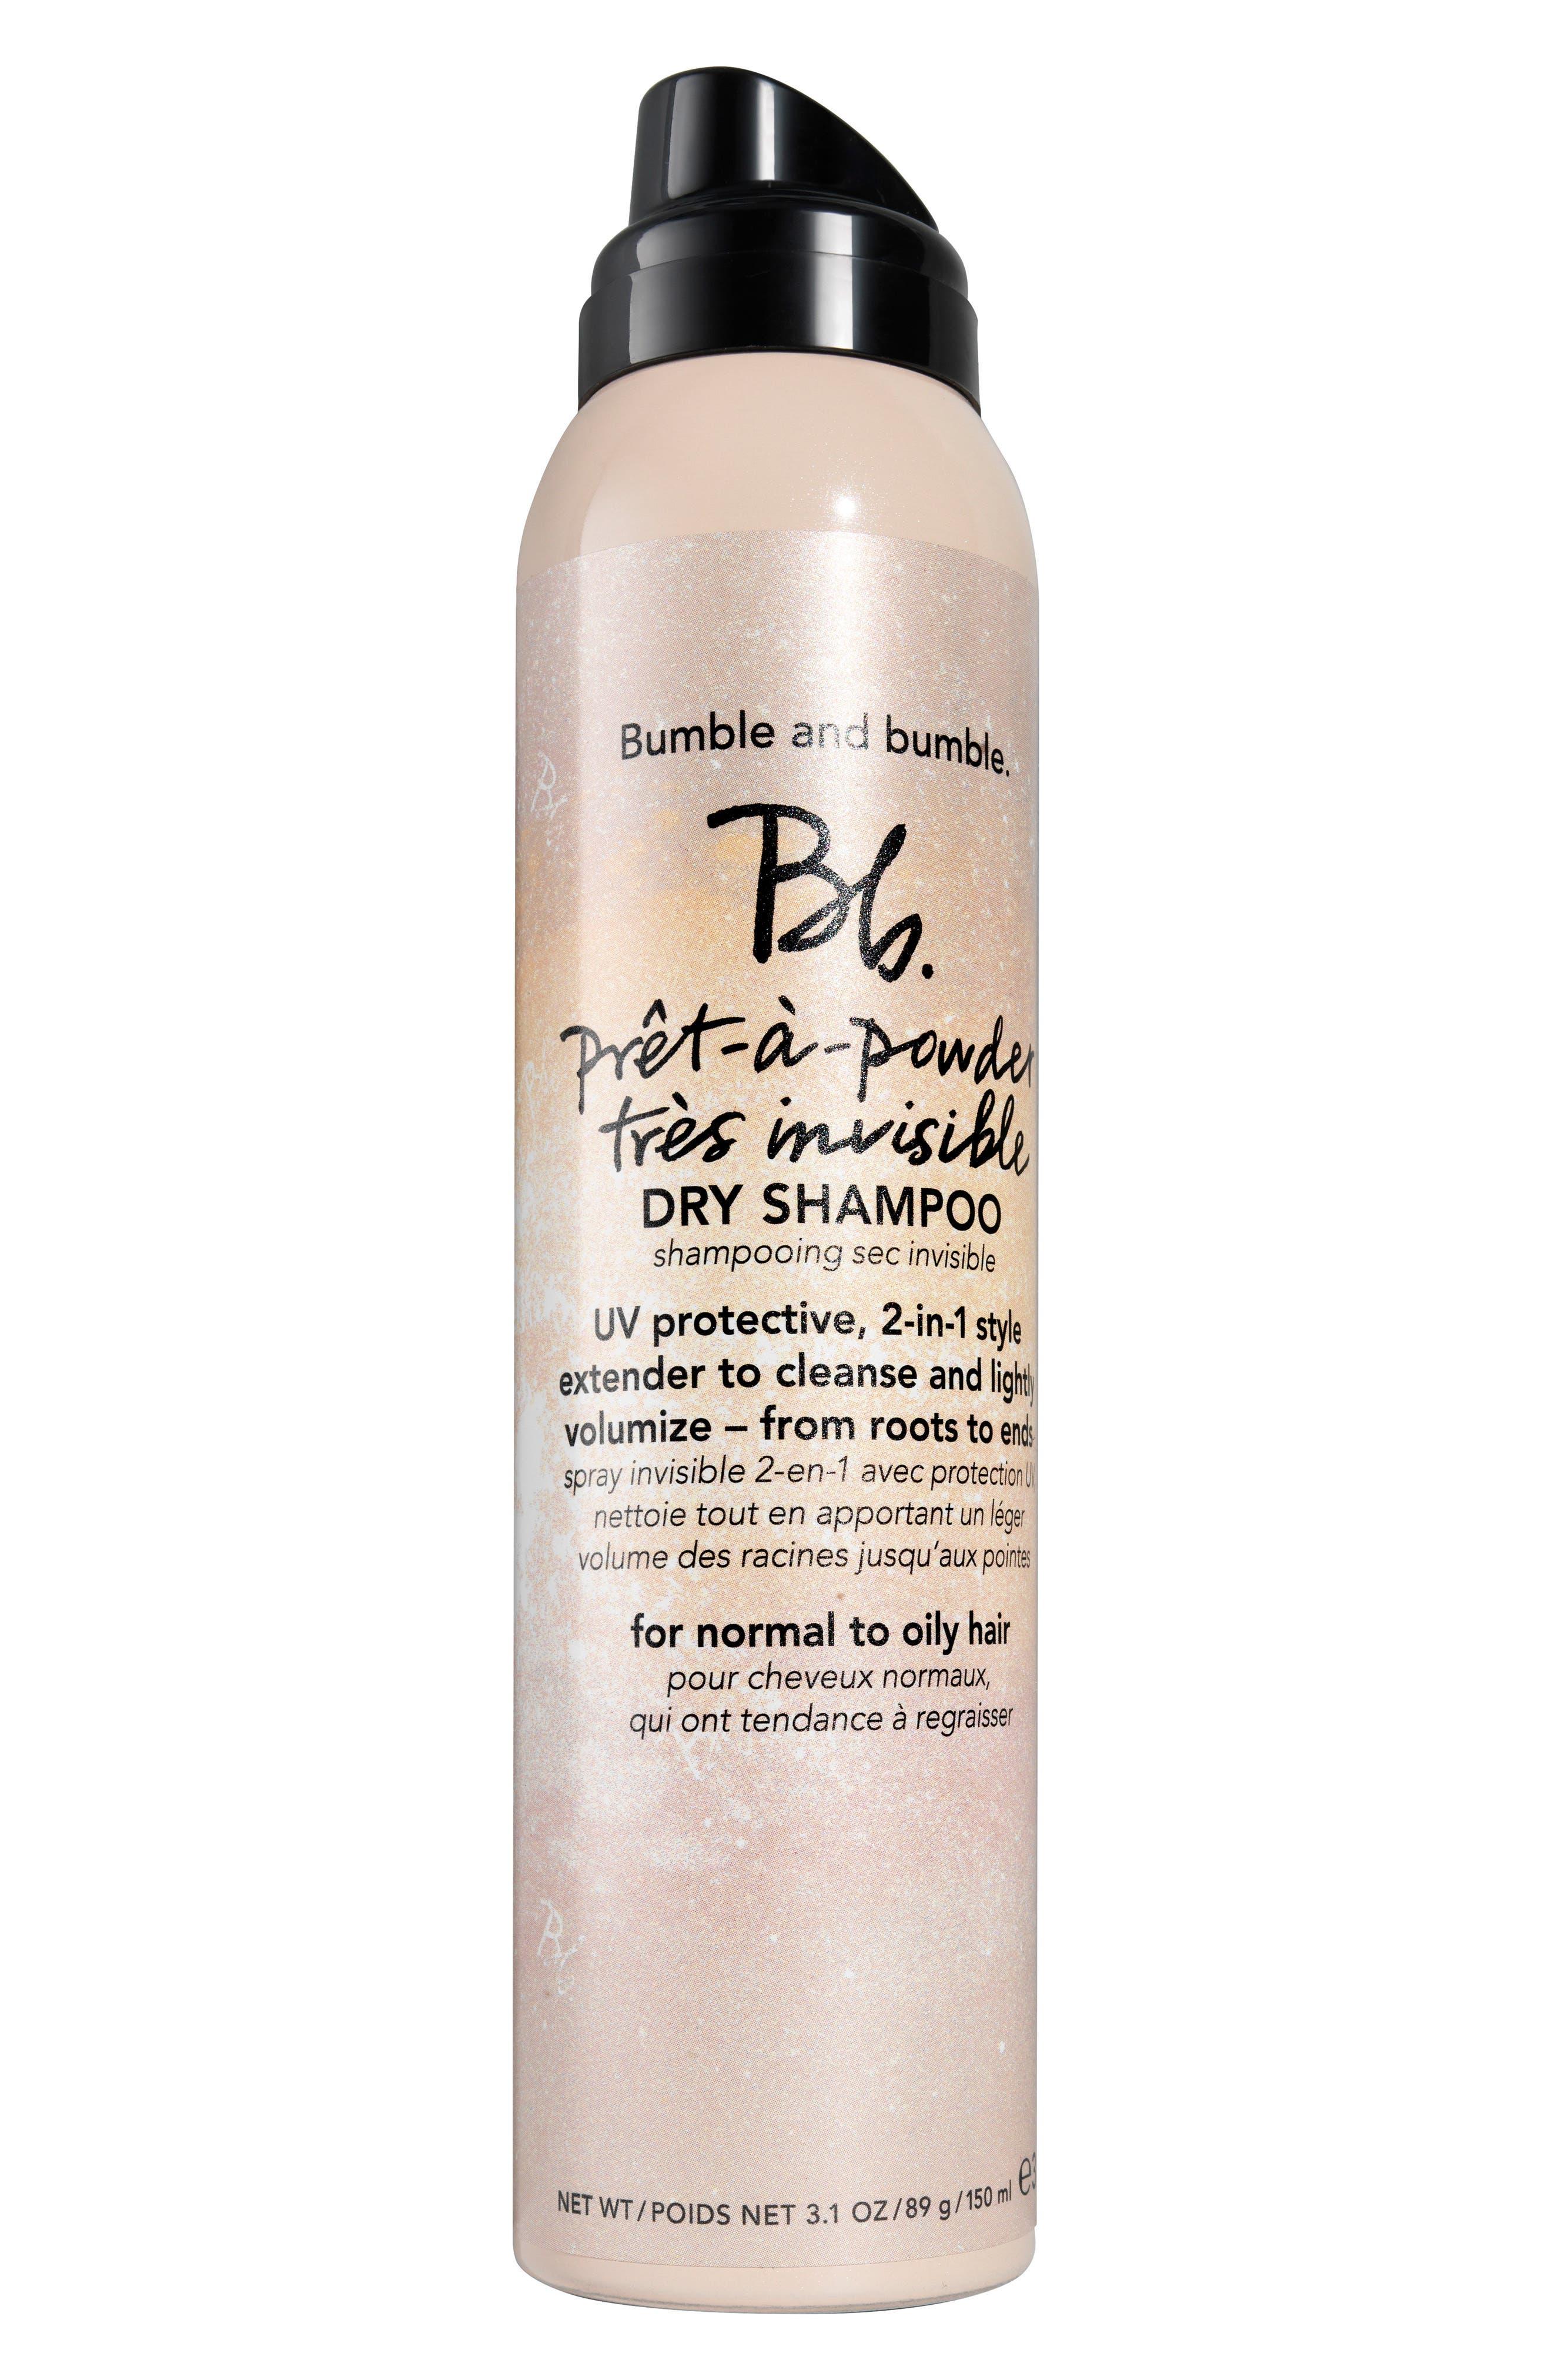 Prêt-a-Powder Très Invisible Dry Shampoo,                             Main thumbnail 1, color,                             No Color